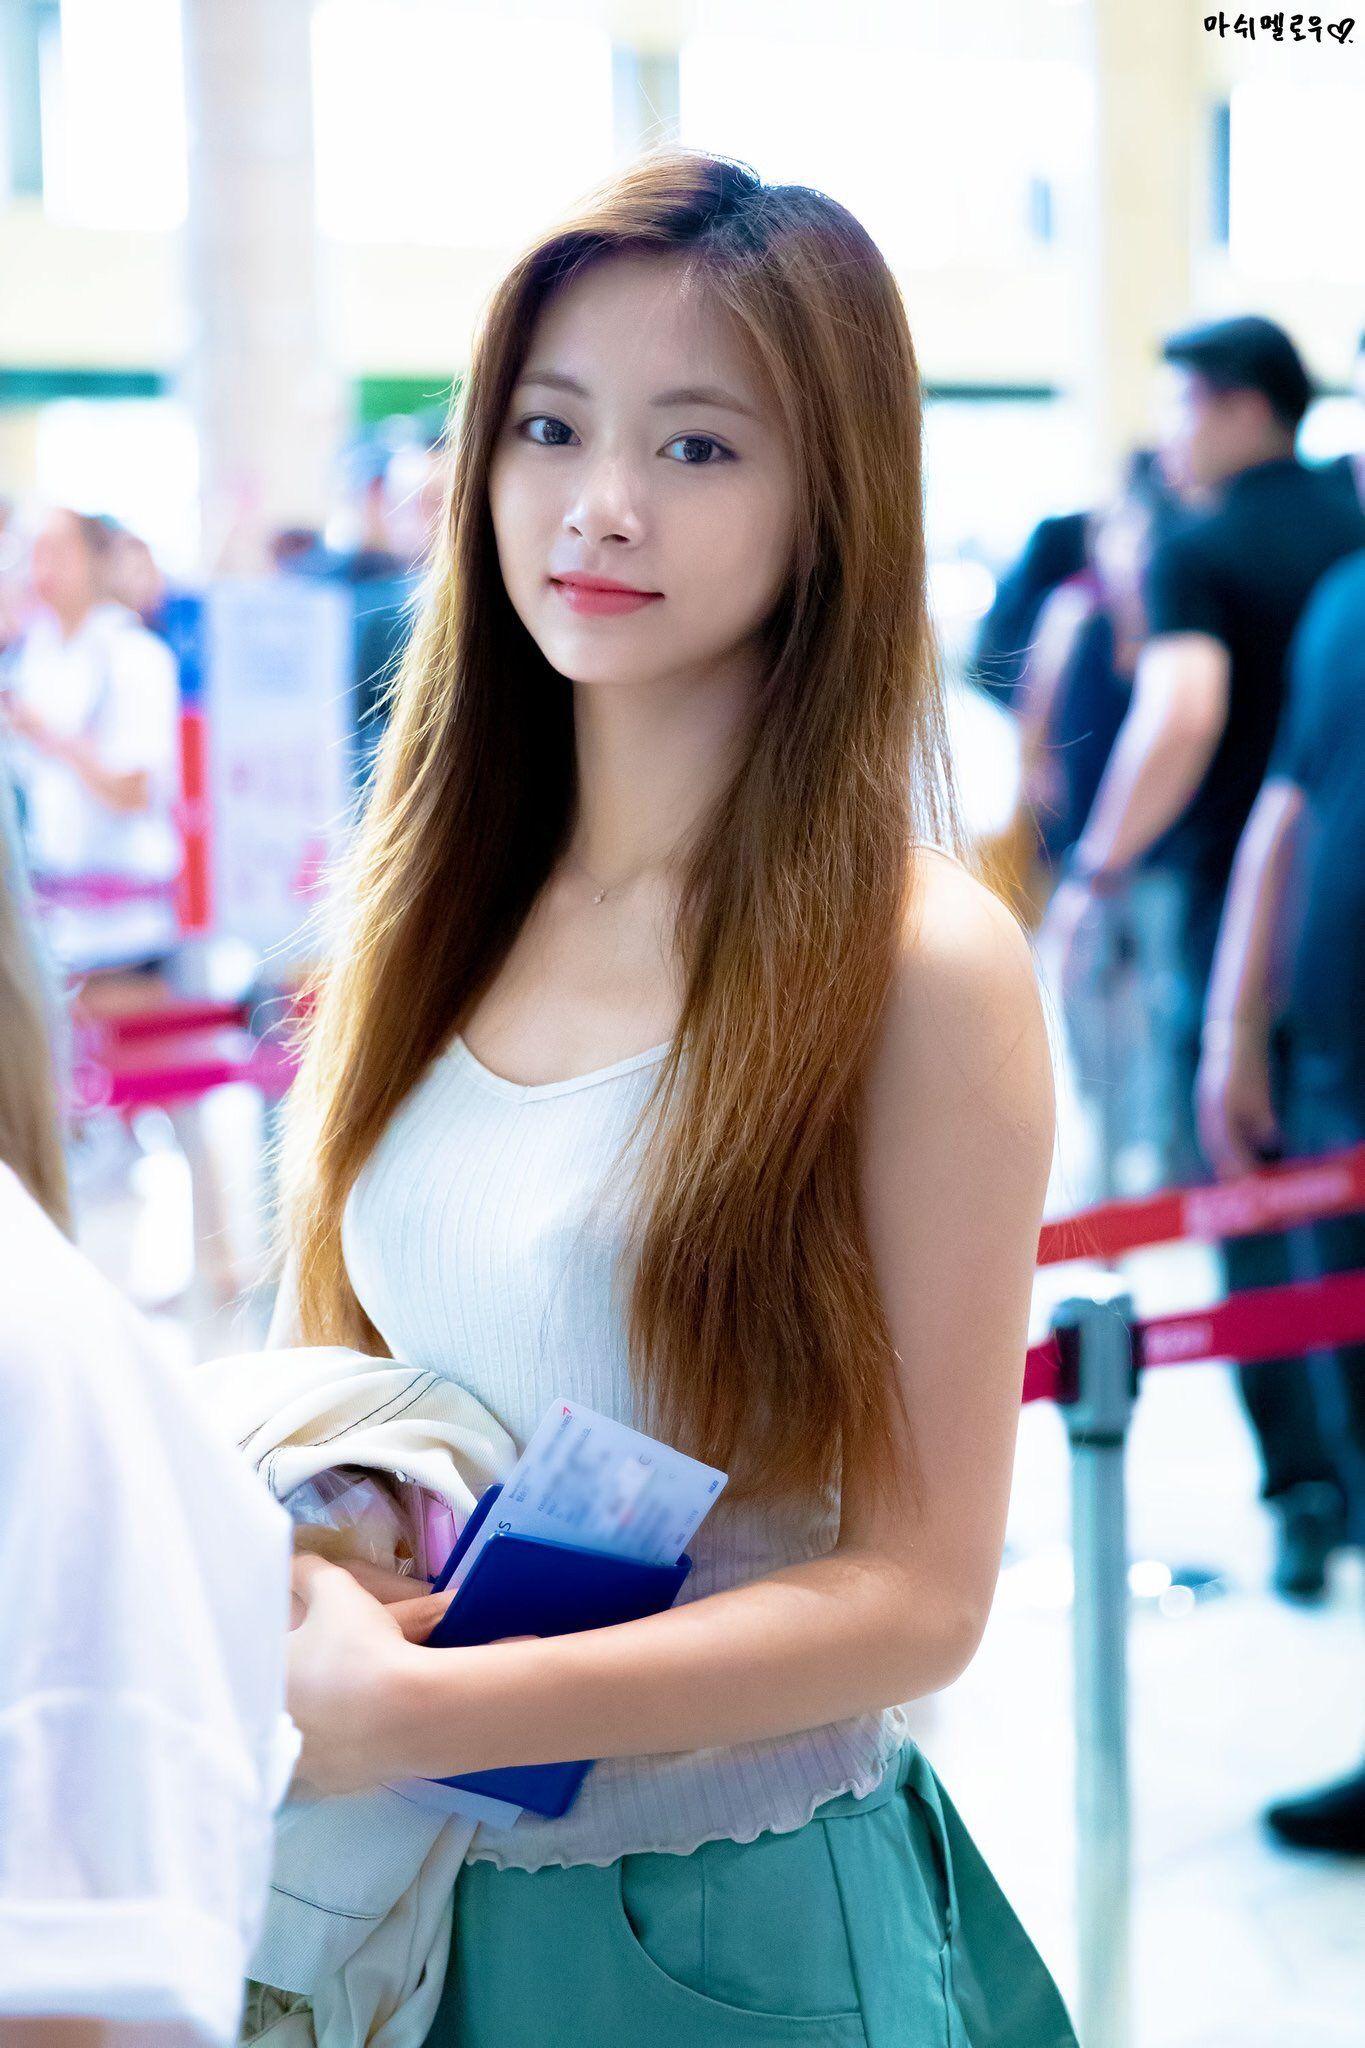 Tzuyu Pics On Twitter Beauty Full Girl 10 Most Beautiful Women Asian Beauty Girl